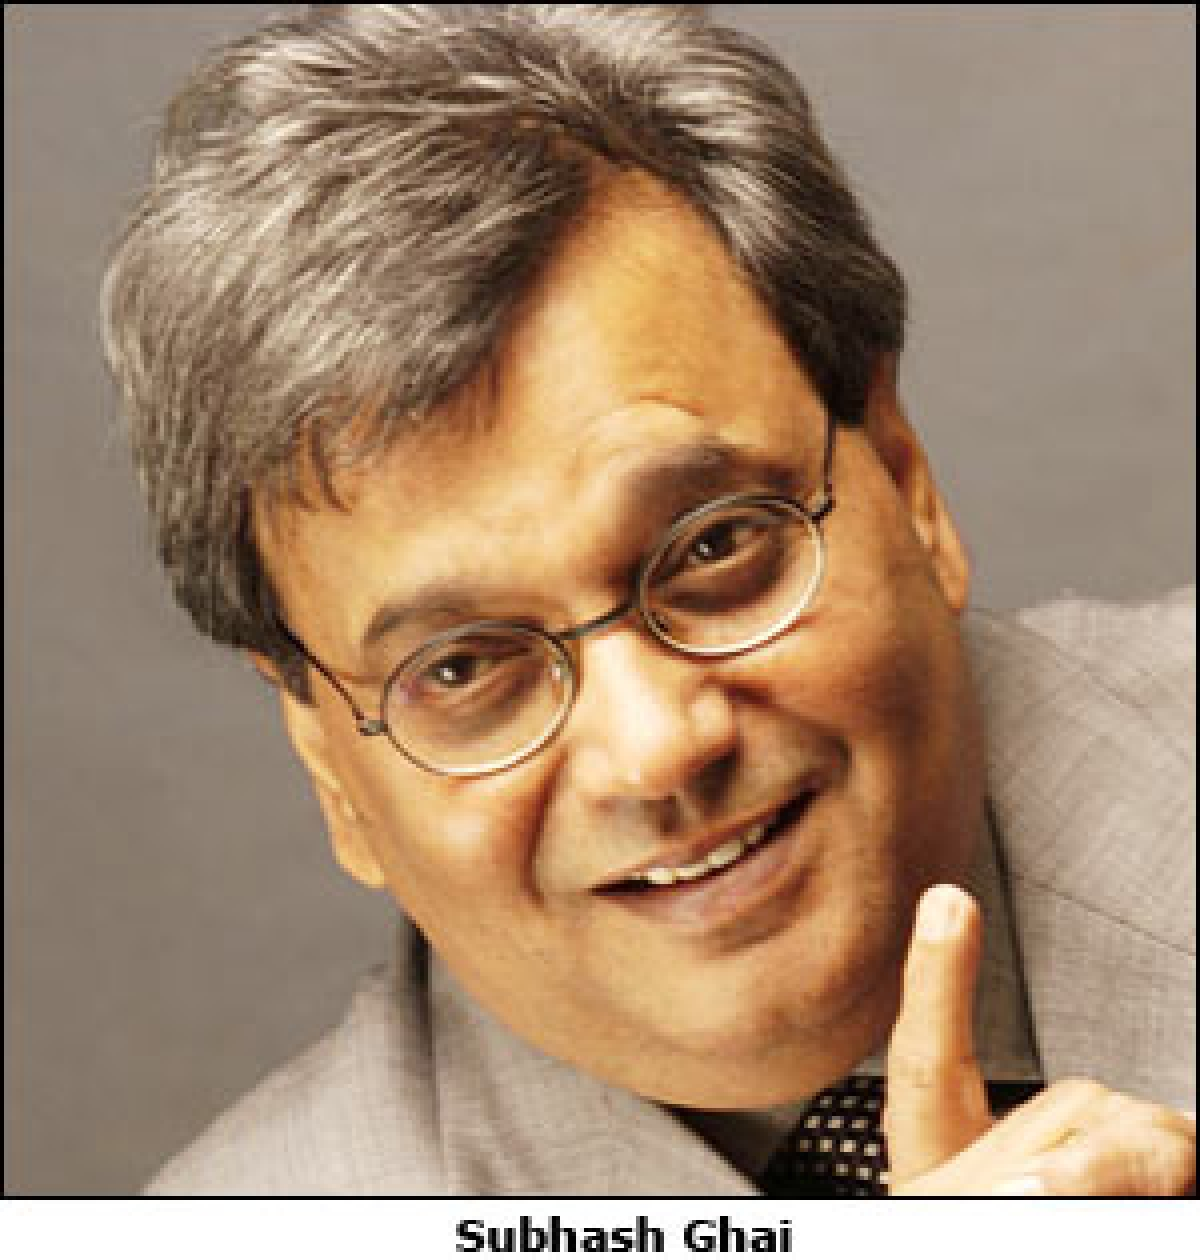 Sony LIV partners with Subhash Ghai's Mukta Arts